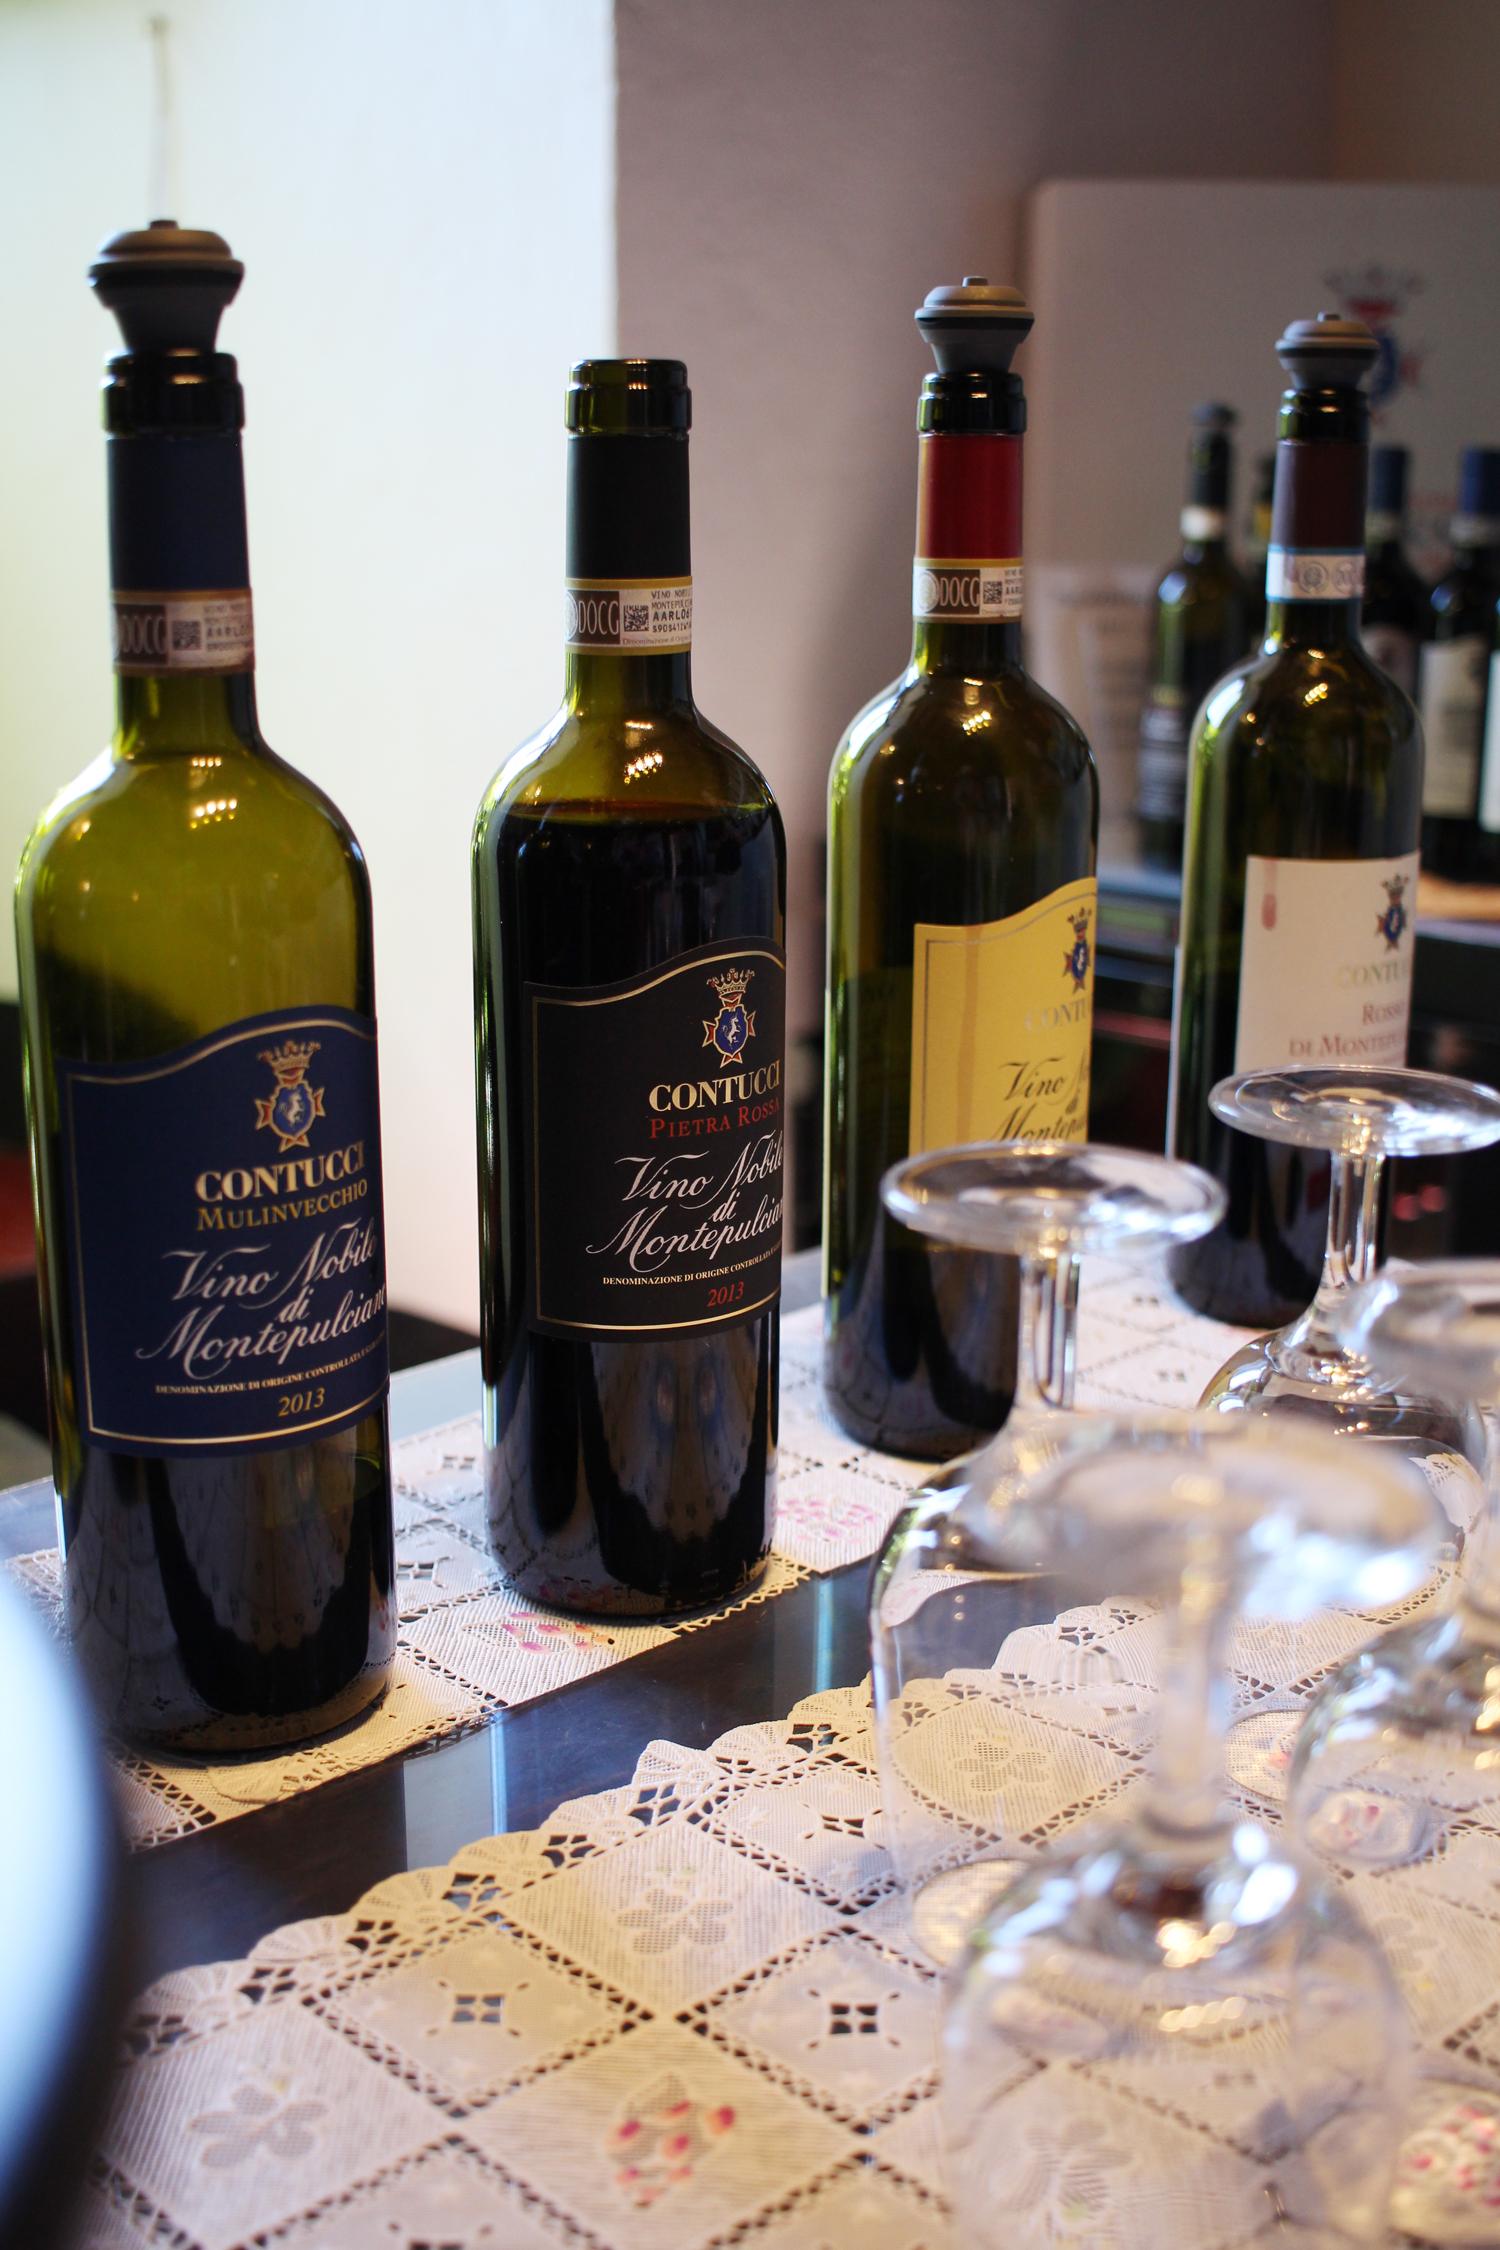 tuscany-italy-montepulciano-travel-blogger-contucci-wine-1